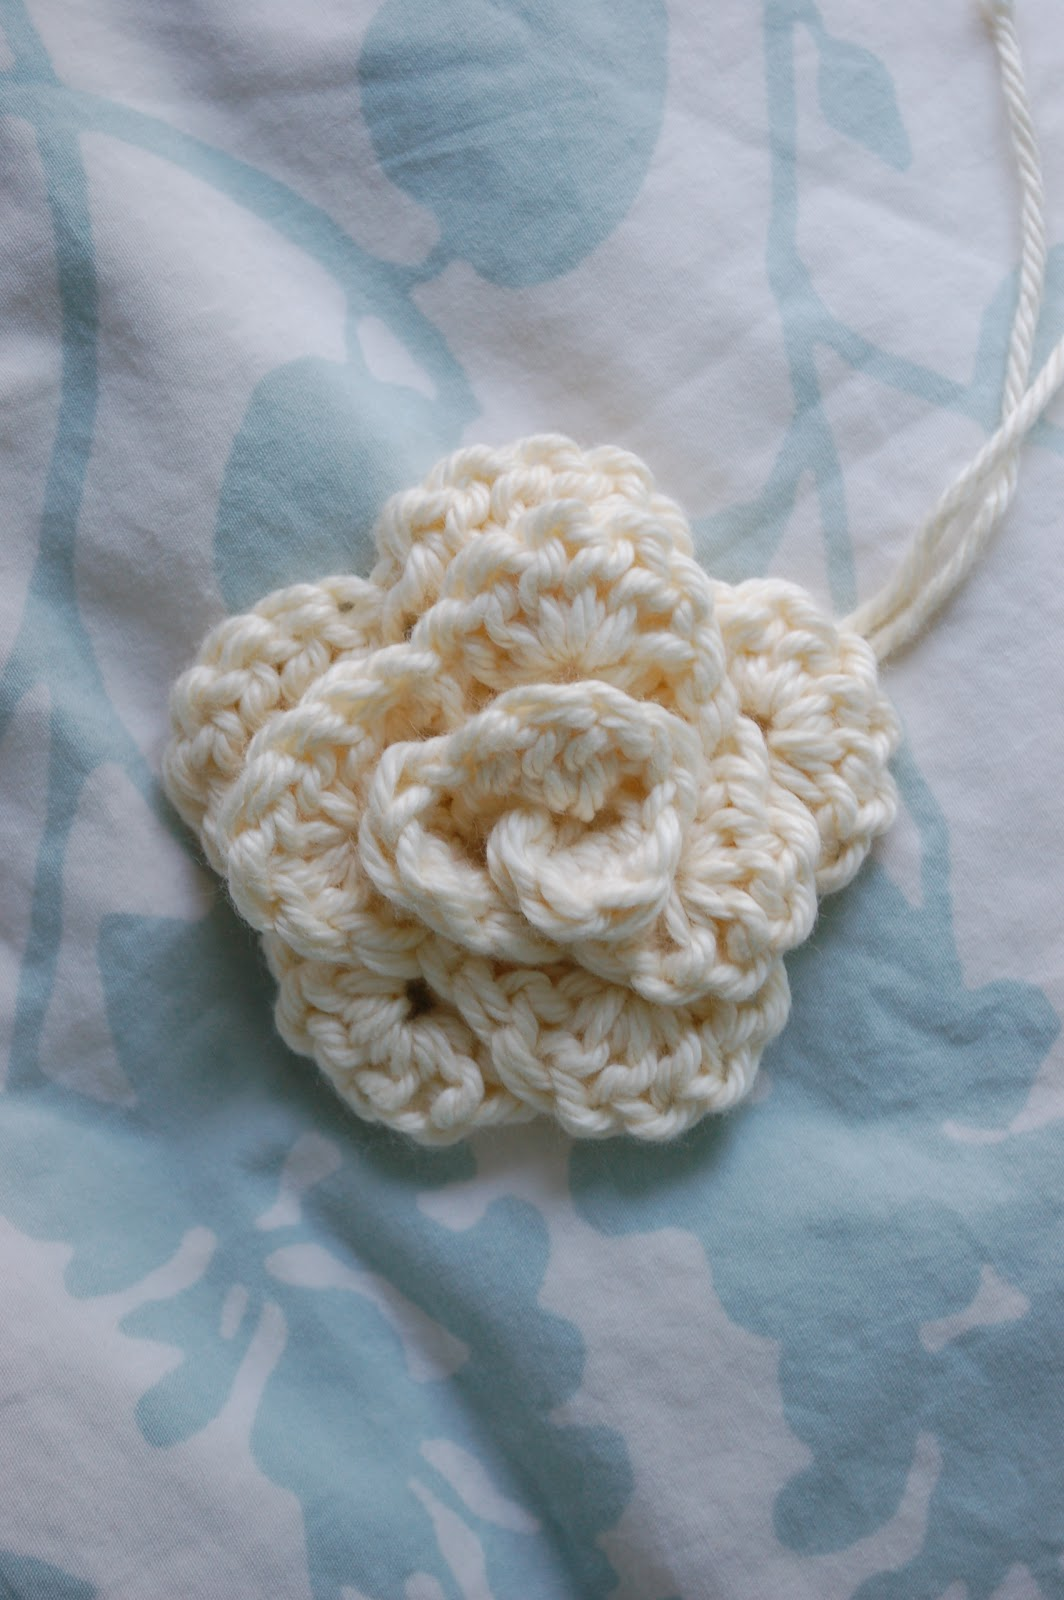 Crochet Rose Pattern No Sew : Alli Crafts: Free Pattern: No-sew Rose